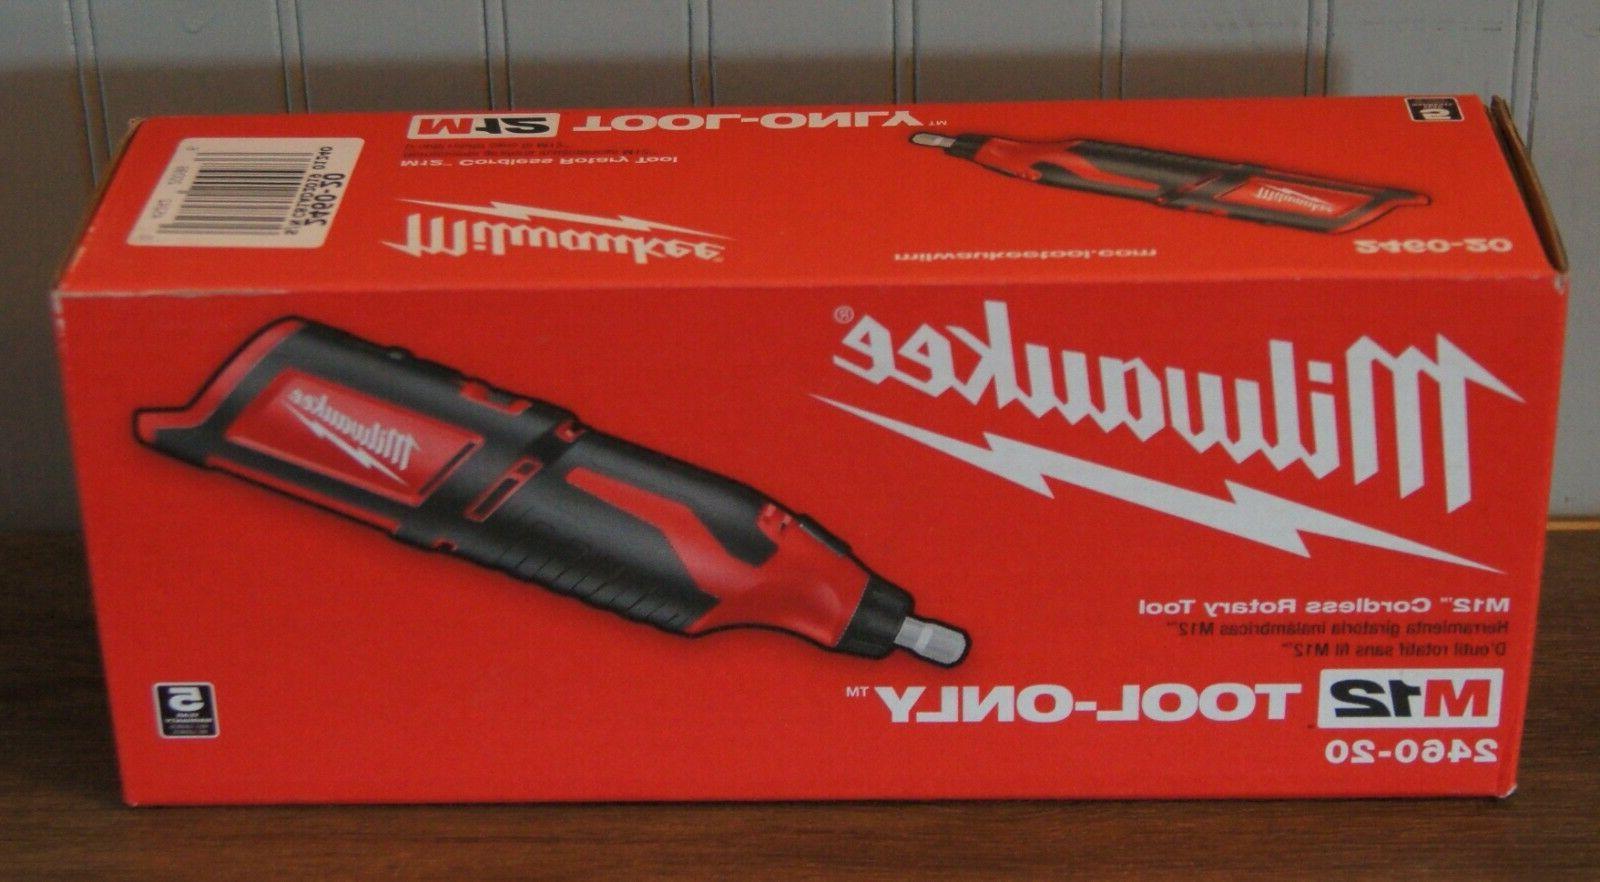 new 12v m12 cordless rotary tool model